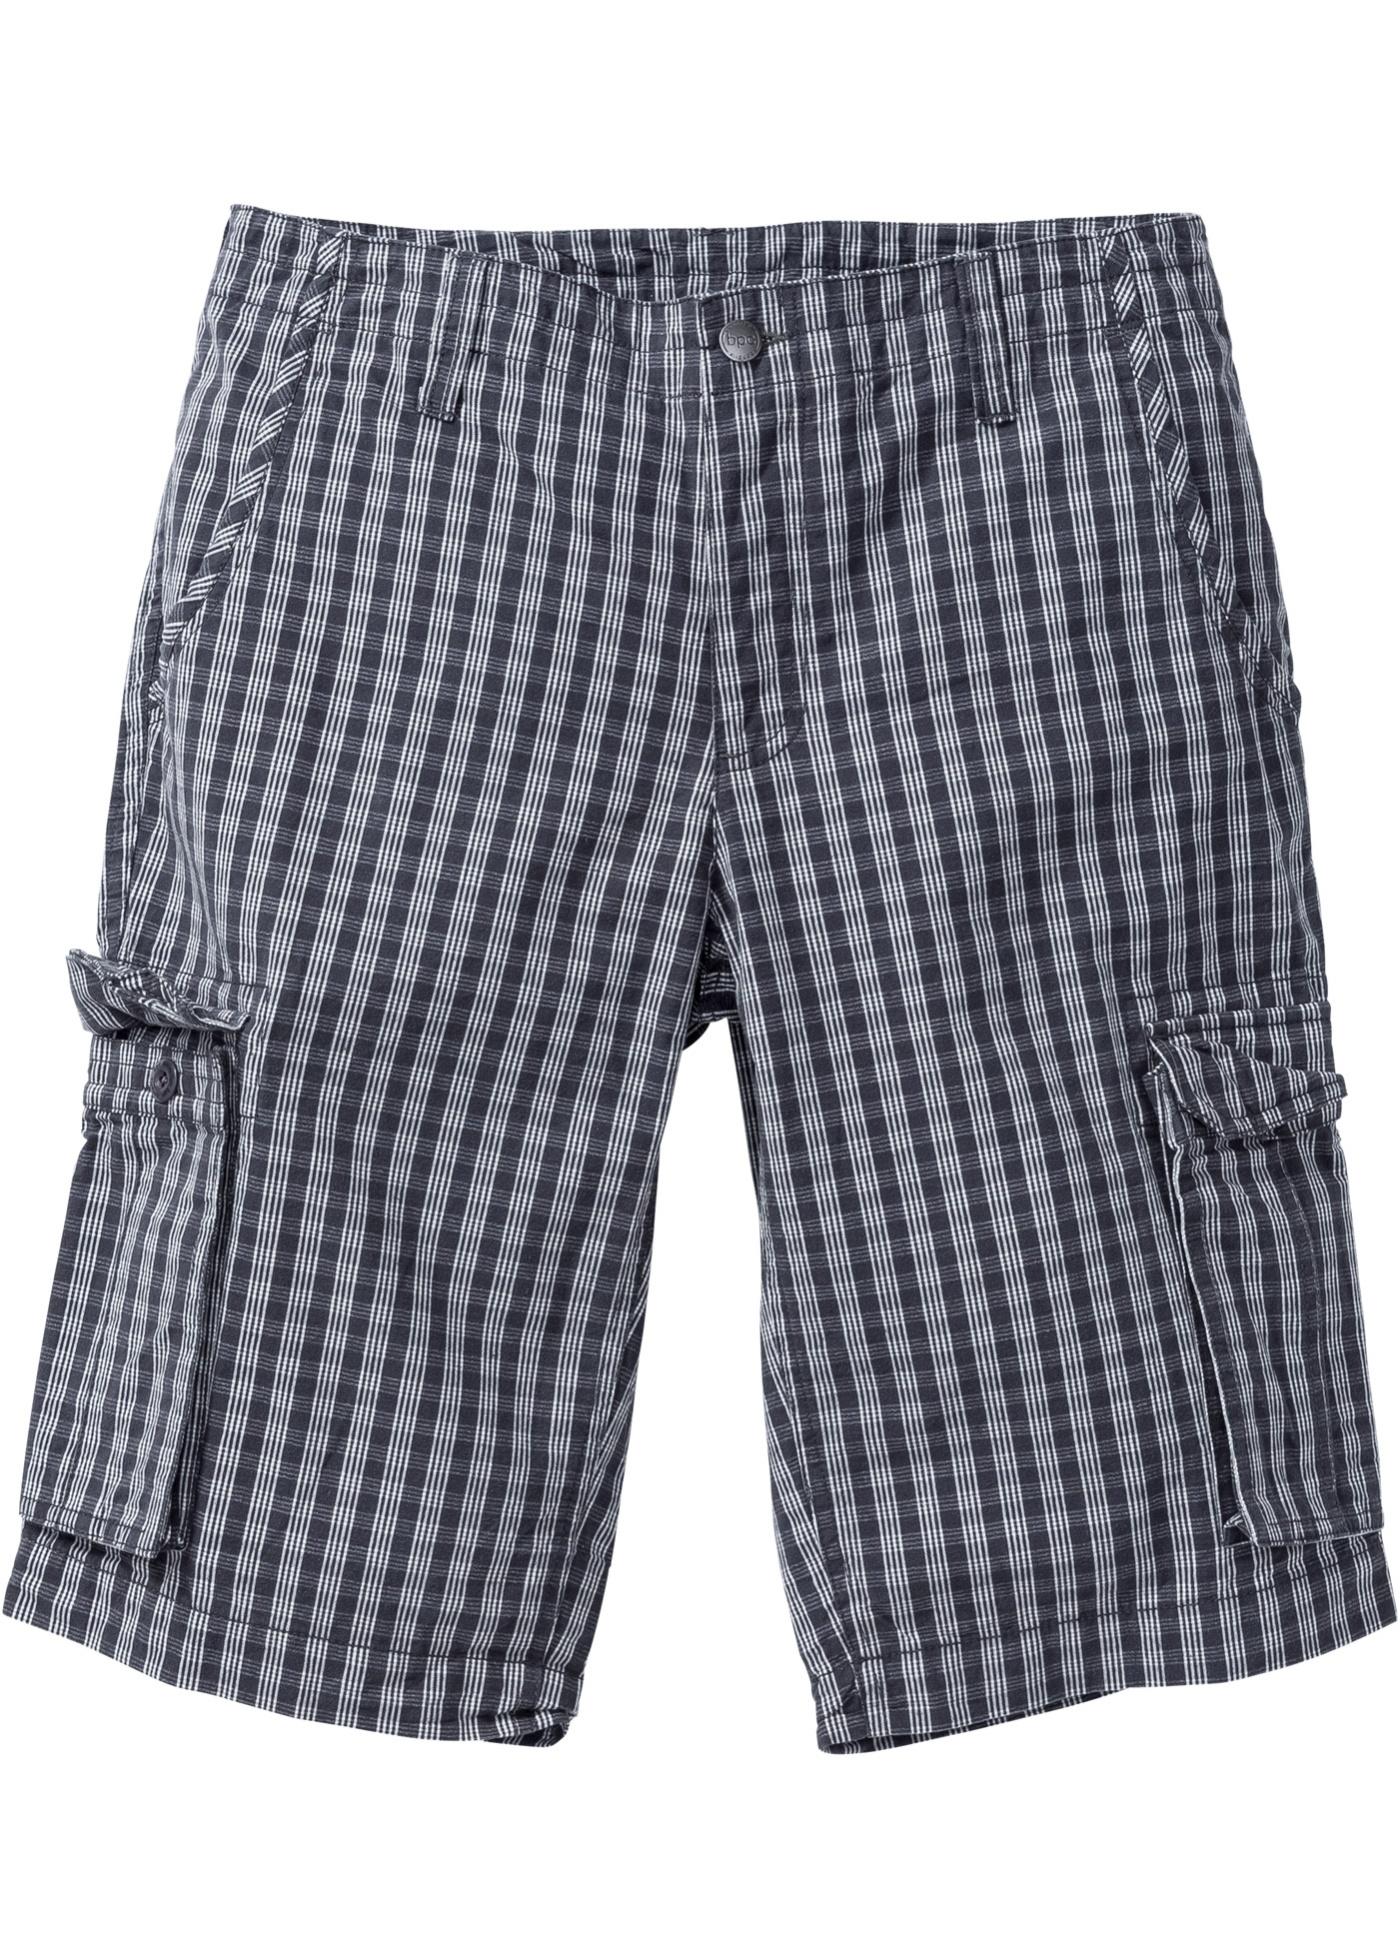 4420f4f9e32a Herren Karo Bermuda Shorts kurze Hose Grey Loose Fit Grau Sommer ...